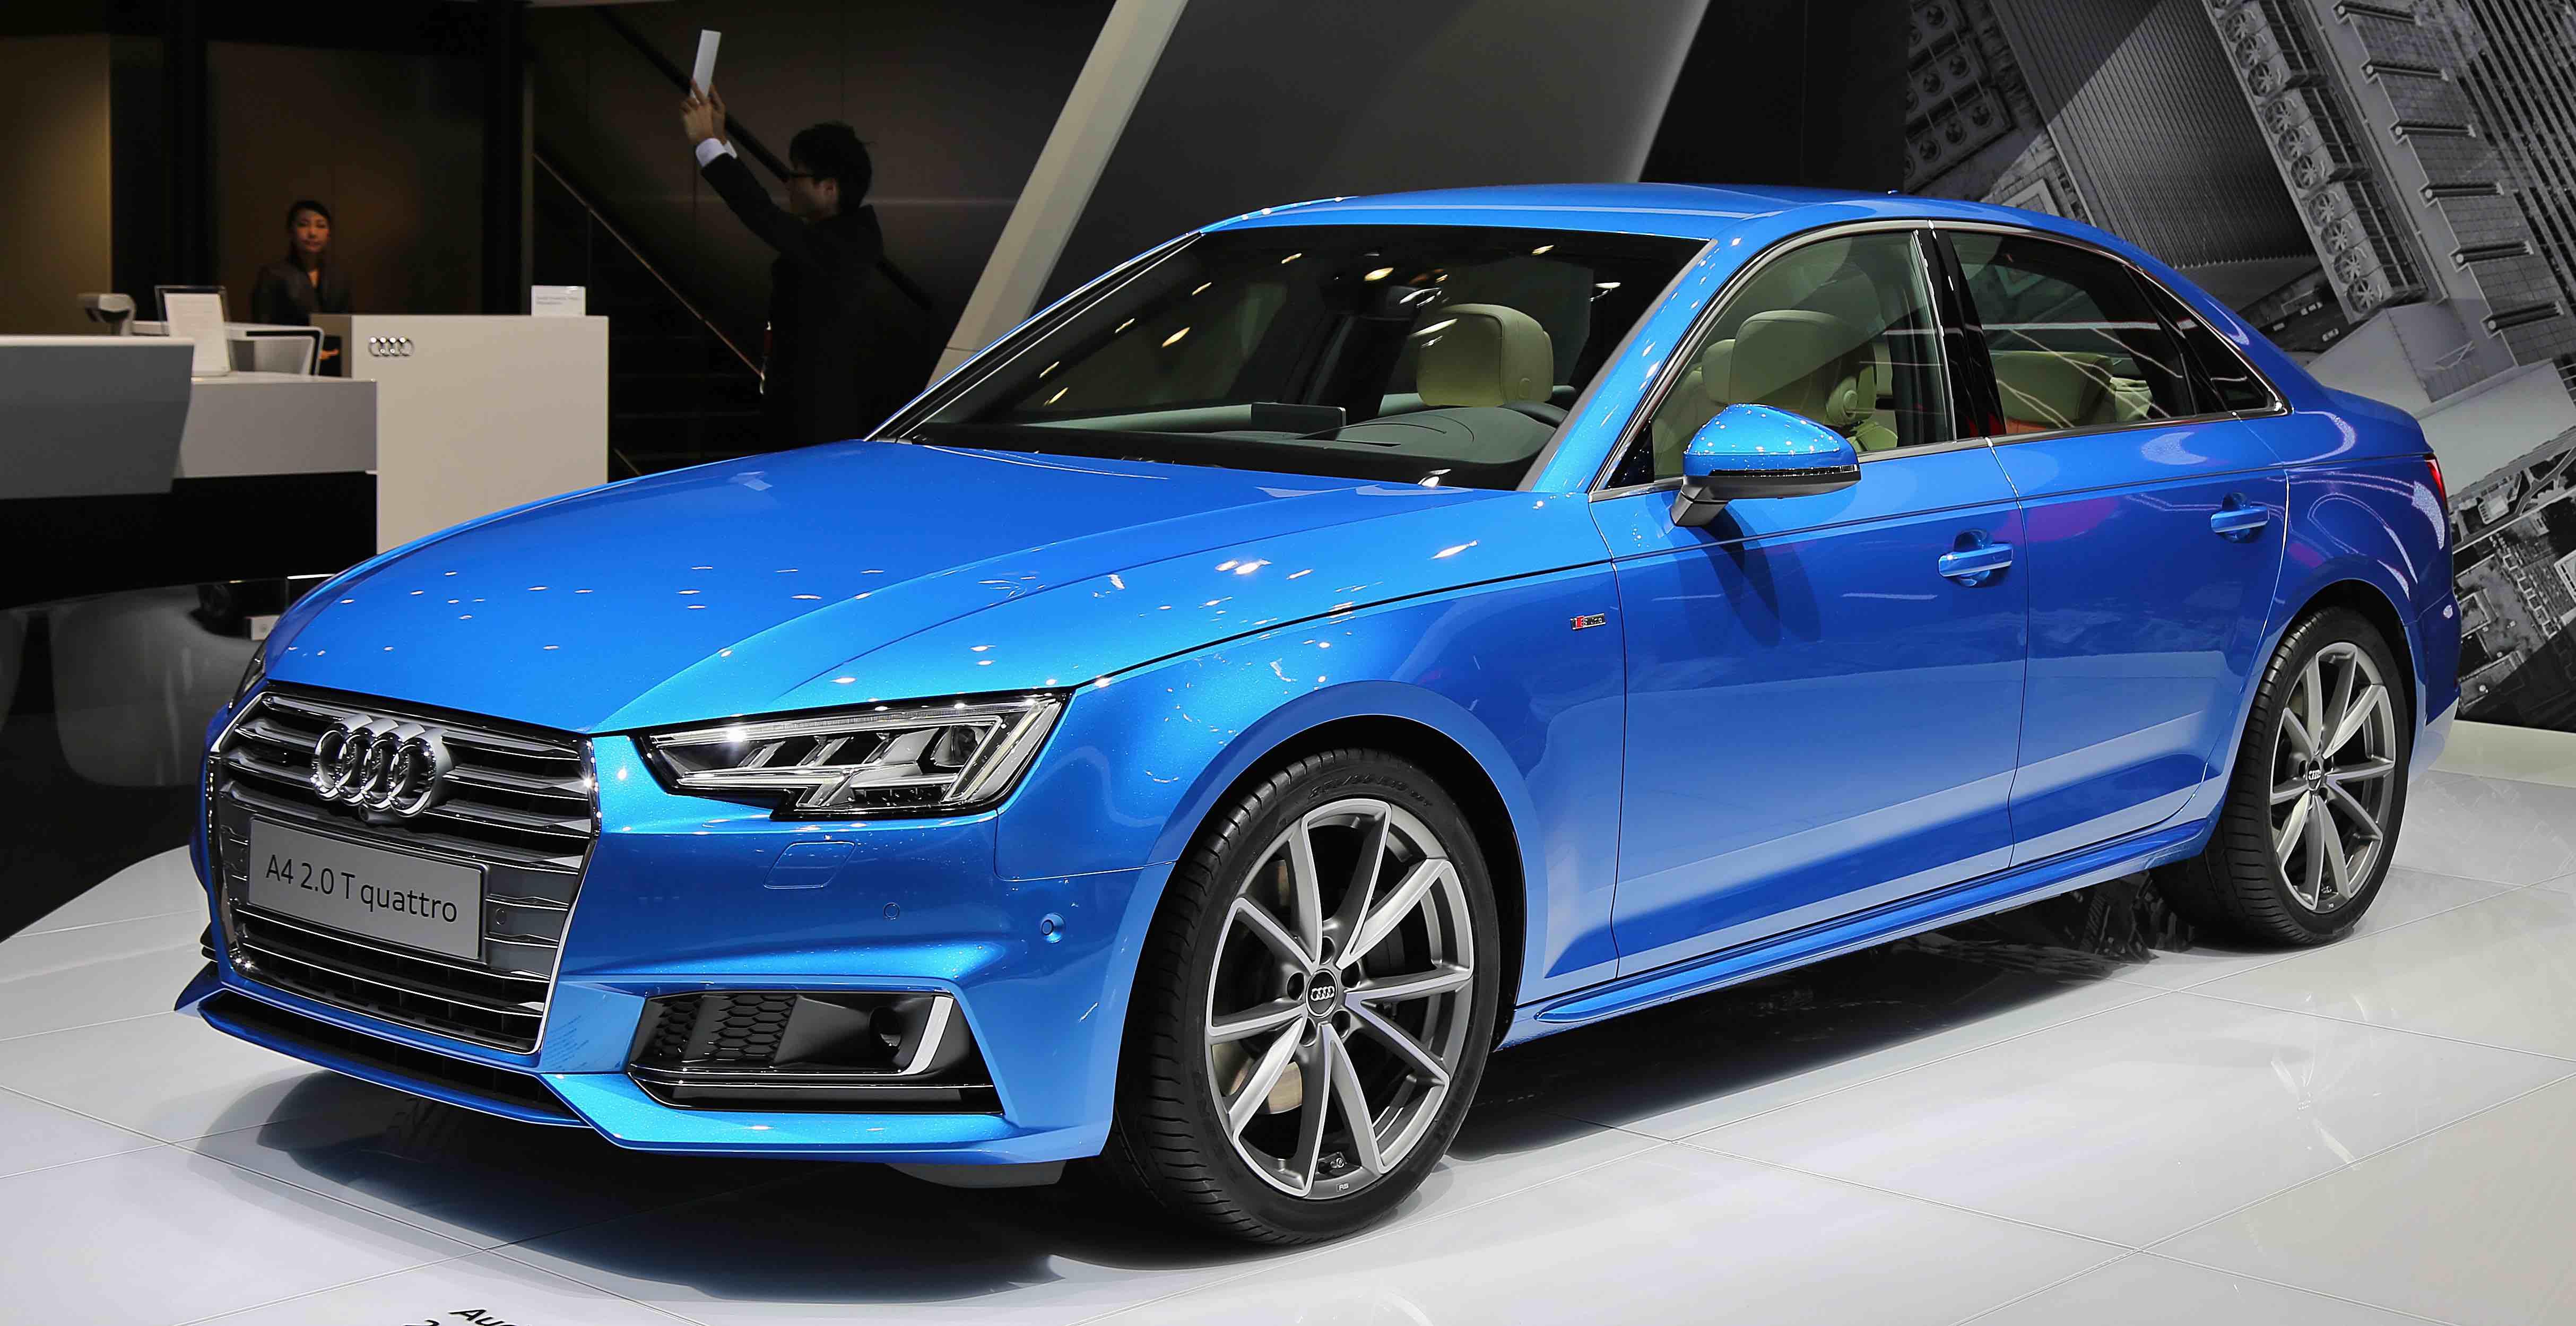 Audi_A4_2.0_TFSI_quattro copy